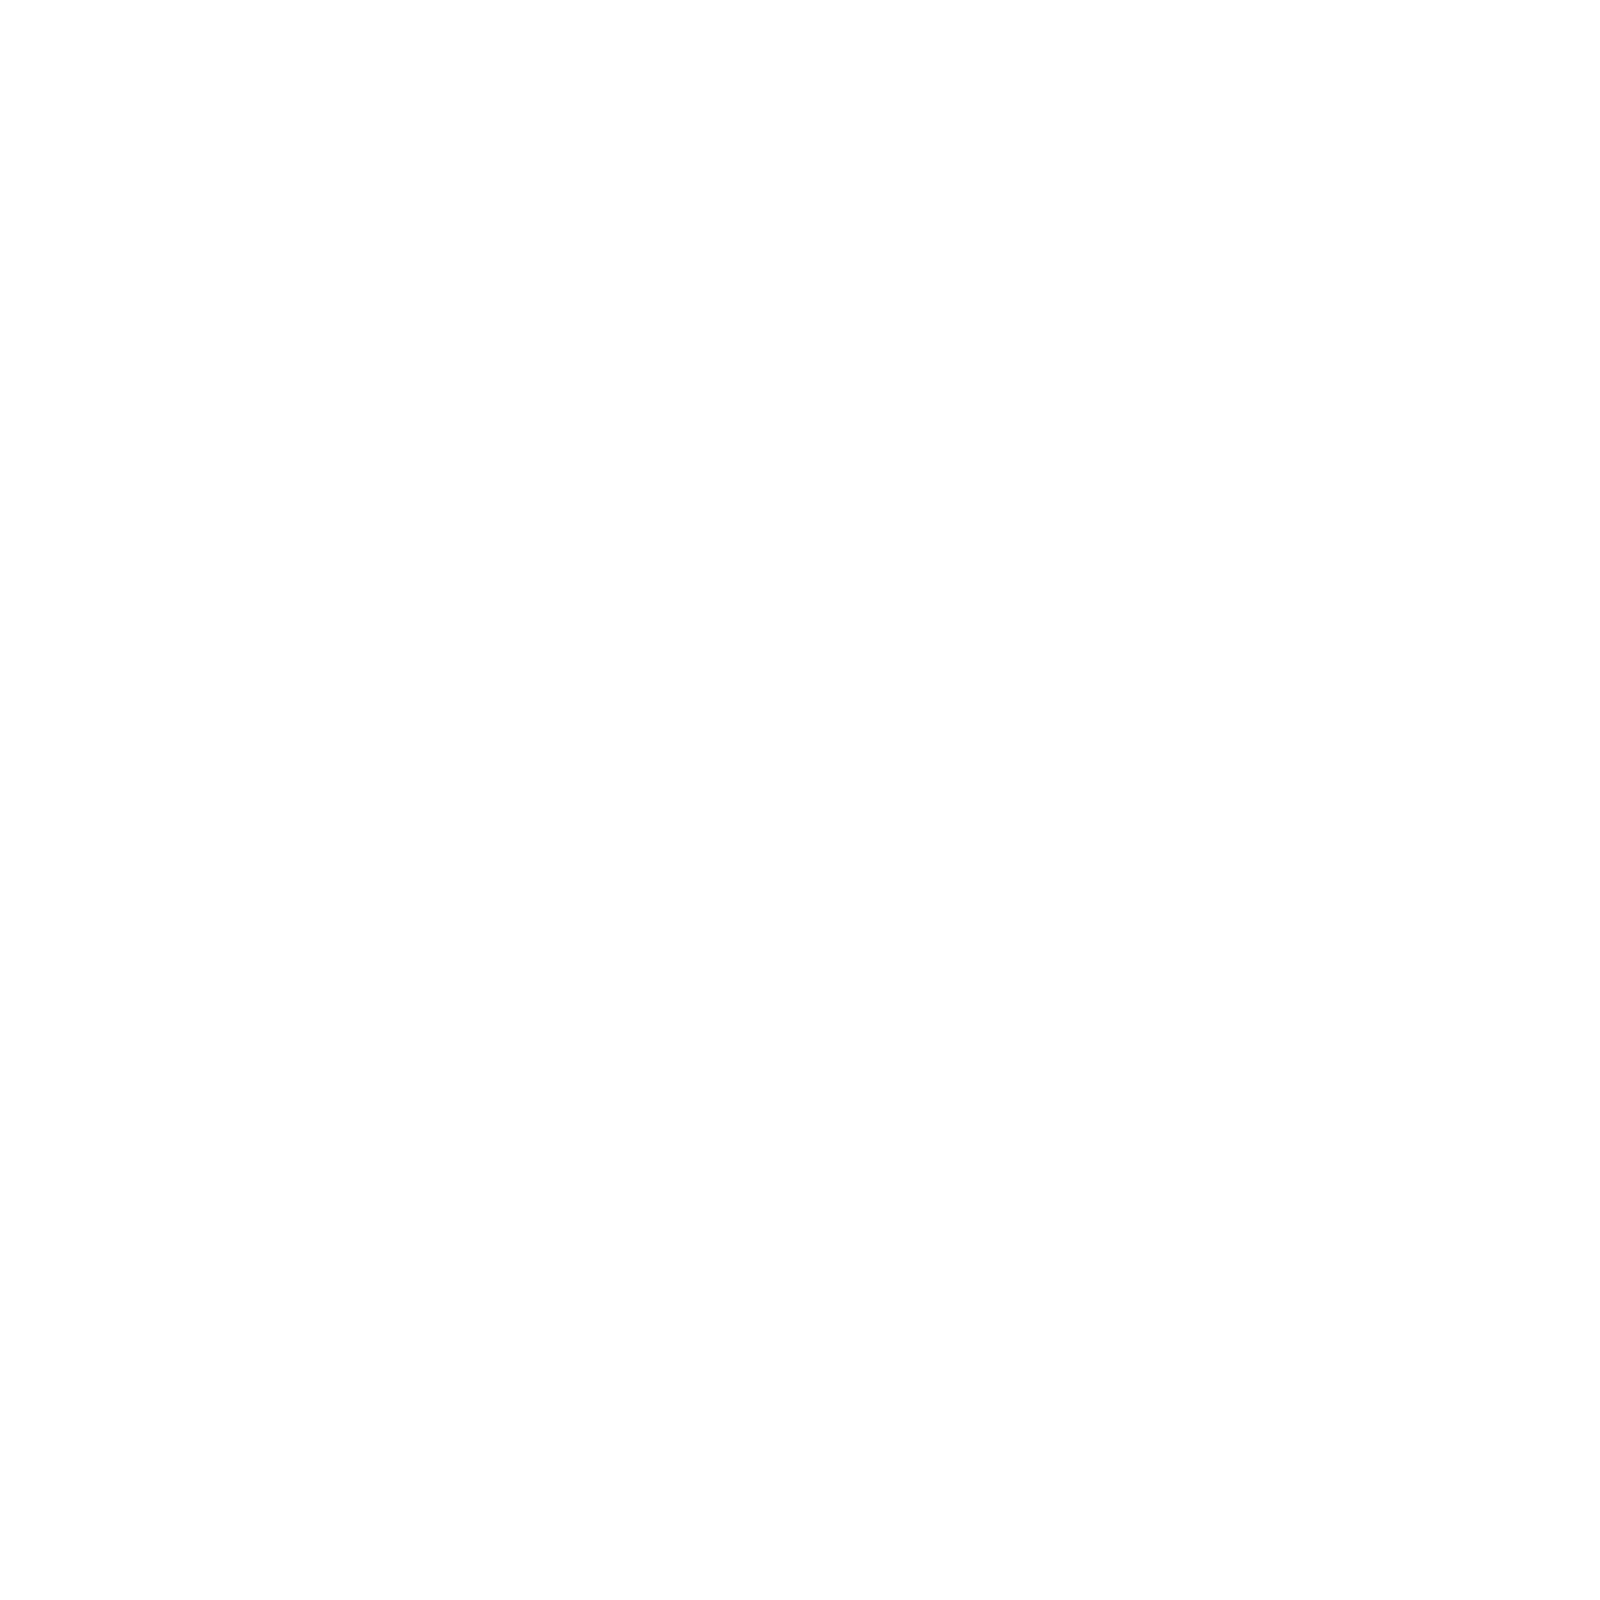 Png vladica djordjevic augusti. Circle clipart round shape